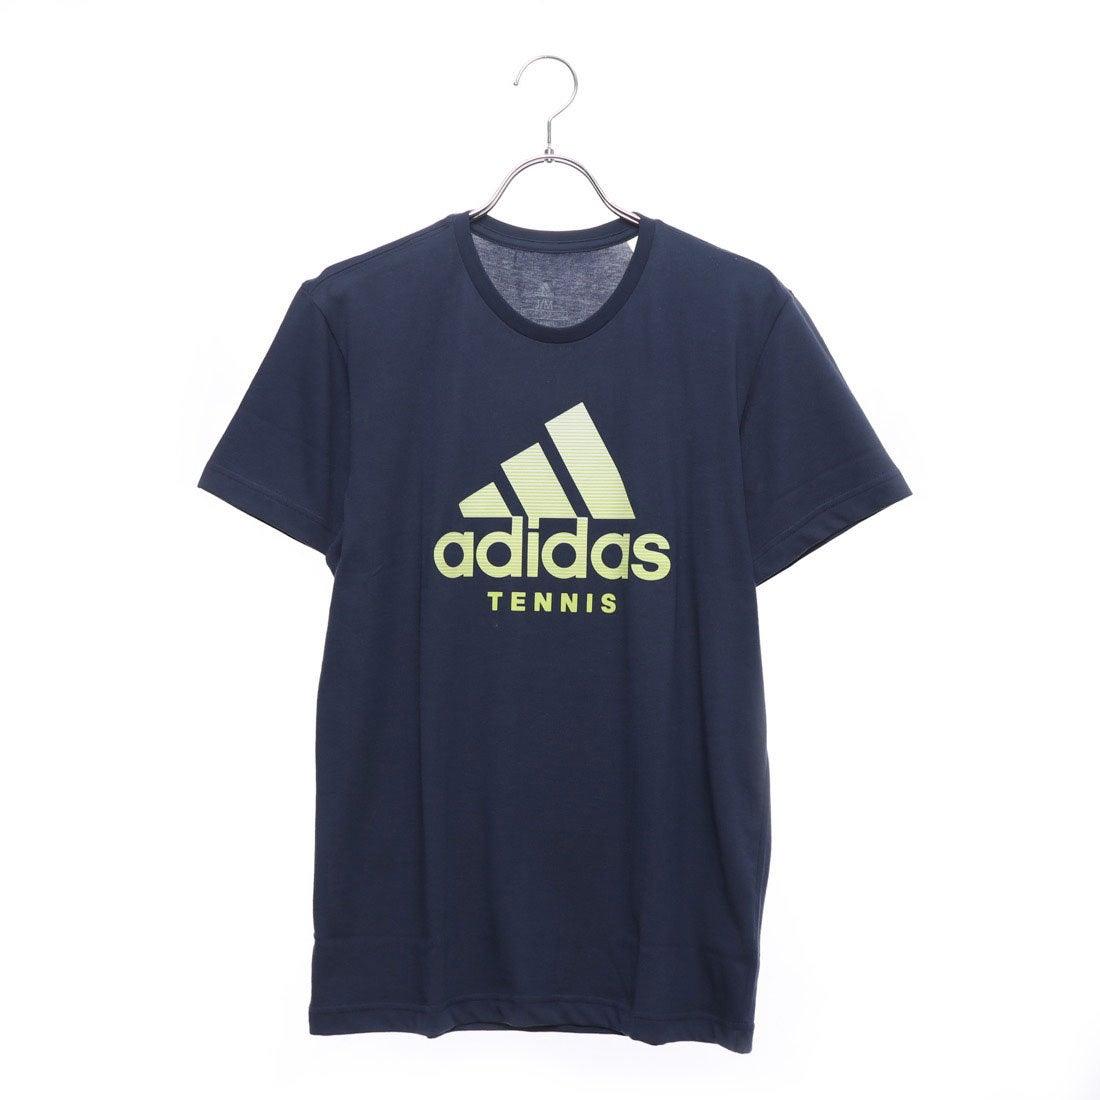 a83a0cb429c19 アディダス adidas メンズ テニス 半袖Tシャツ TENNIS APP MEN CV4292 -レディースファッション通販  ロコンドガールズコレクション (LOCONDO GIRL'S COLLECTION)